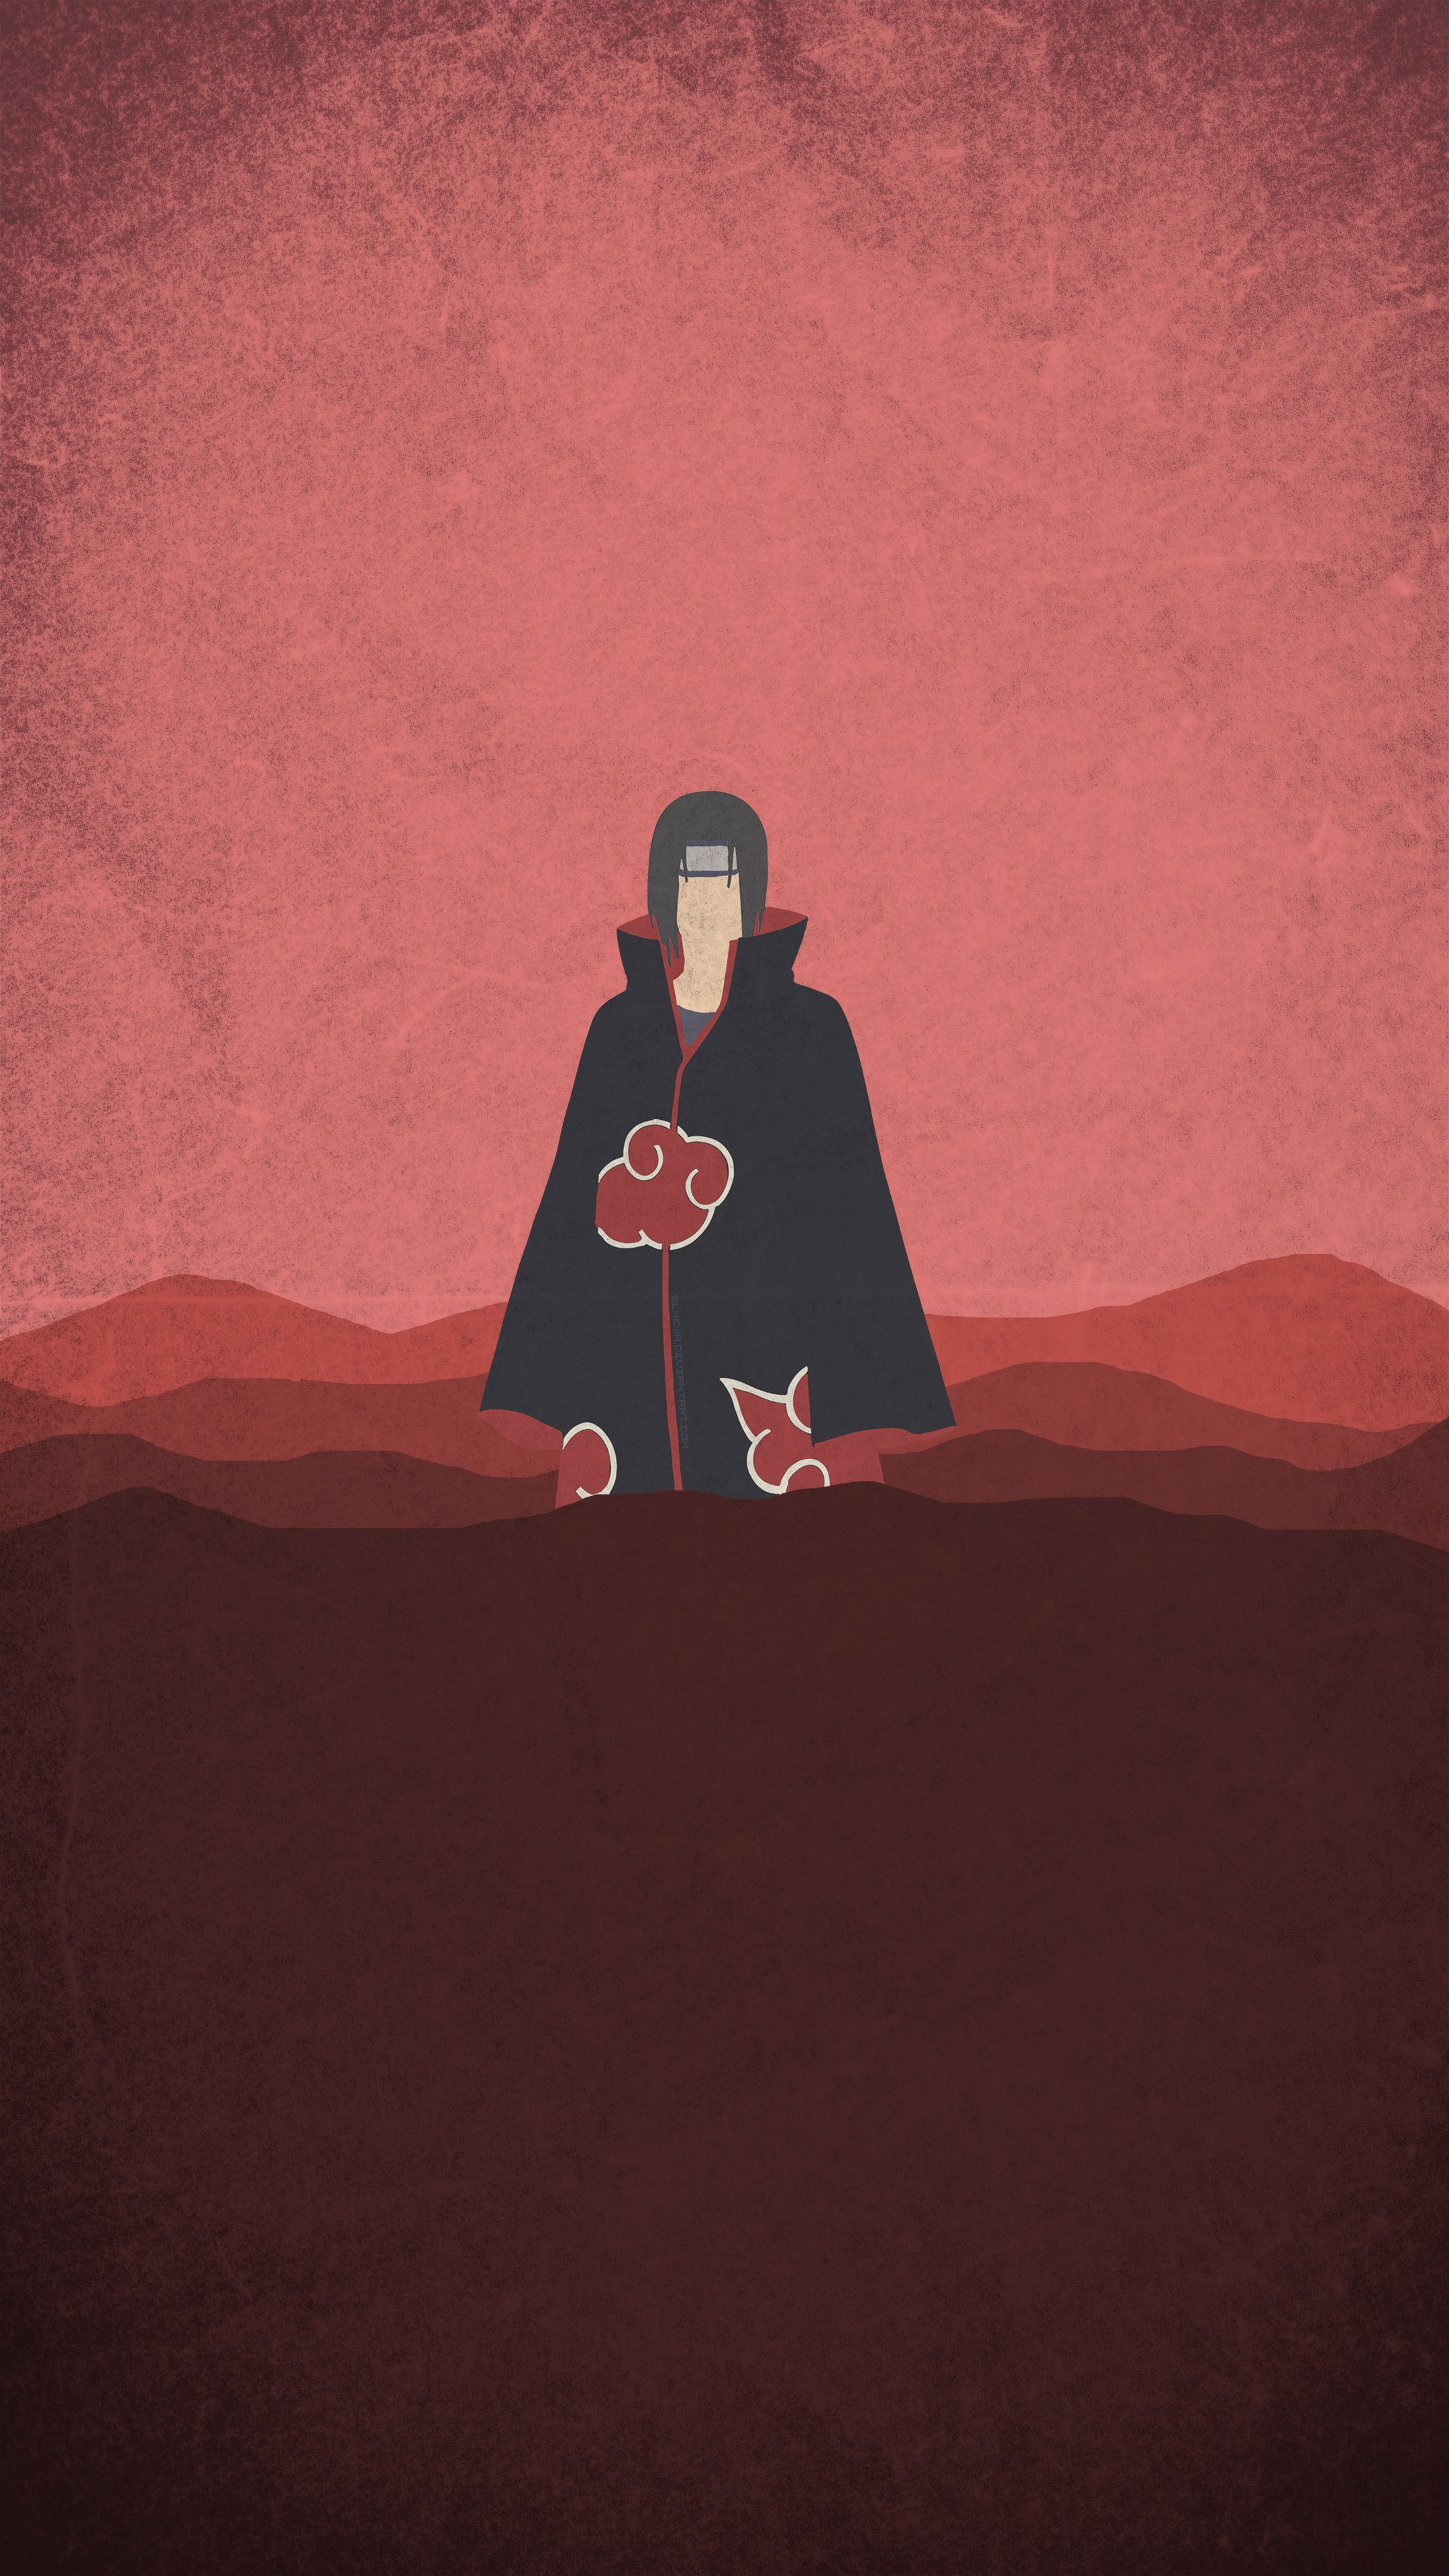 Naruto Itachi Iphone Wallpapers Top Free Naruto Itachi Iphone Backgrounds Wallpaperaccess